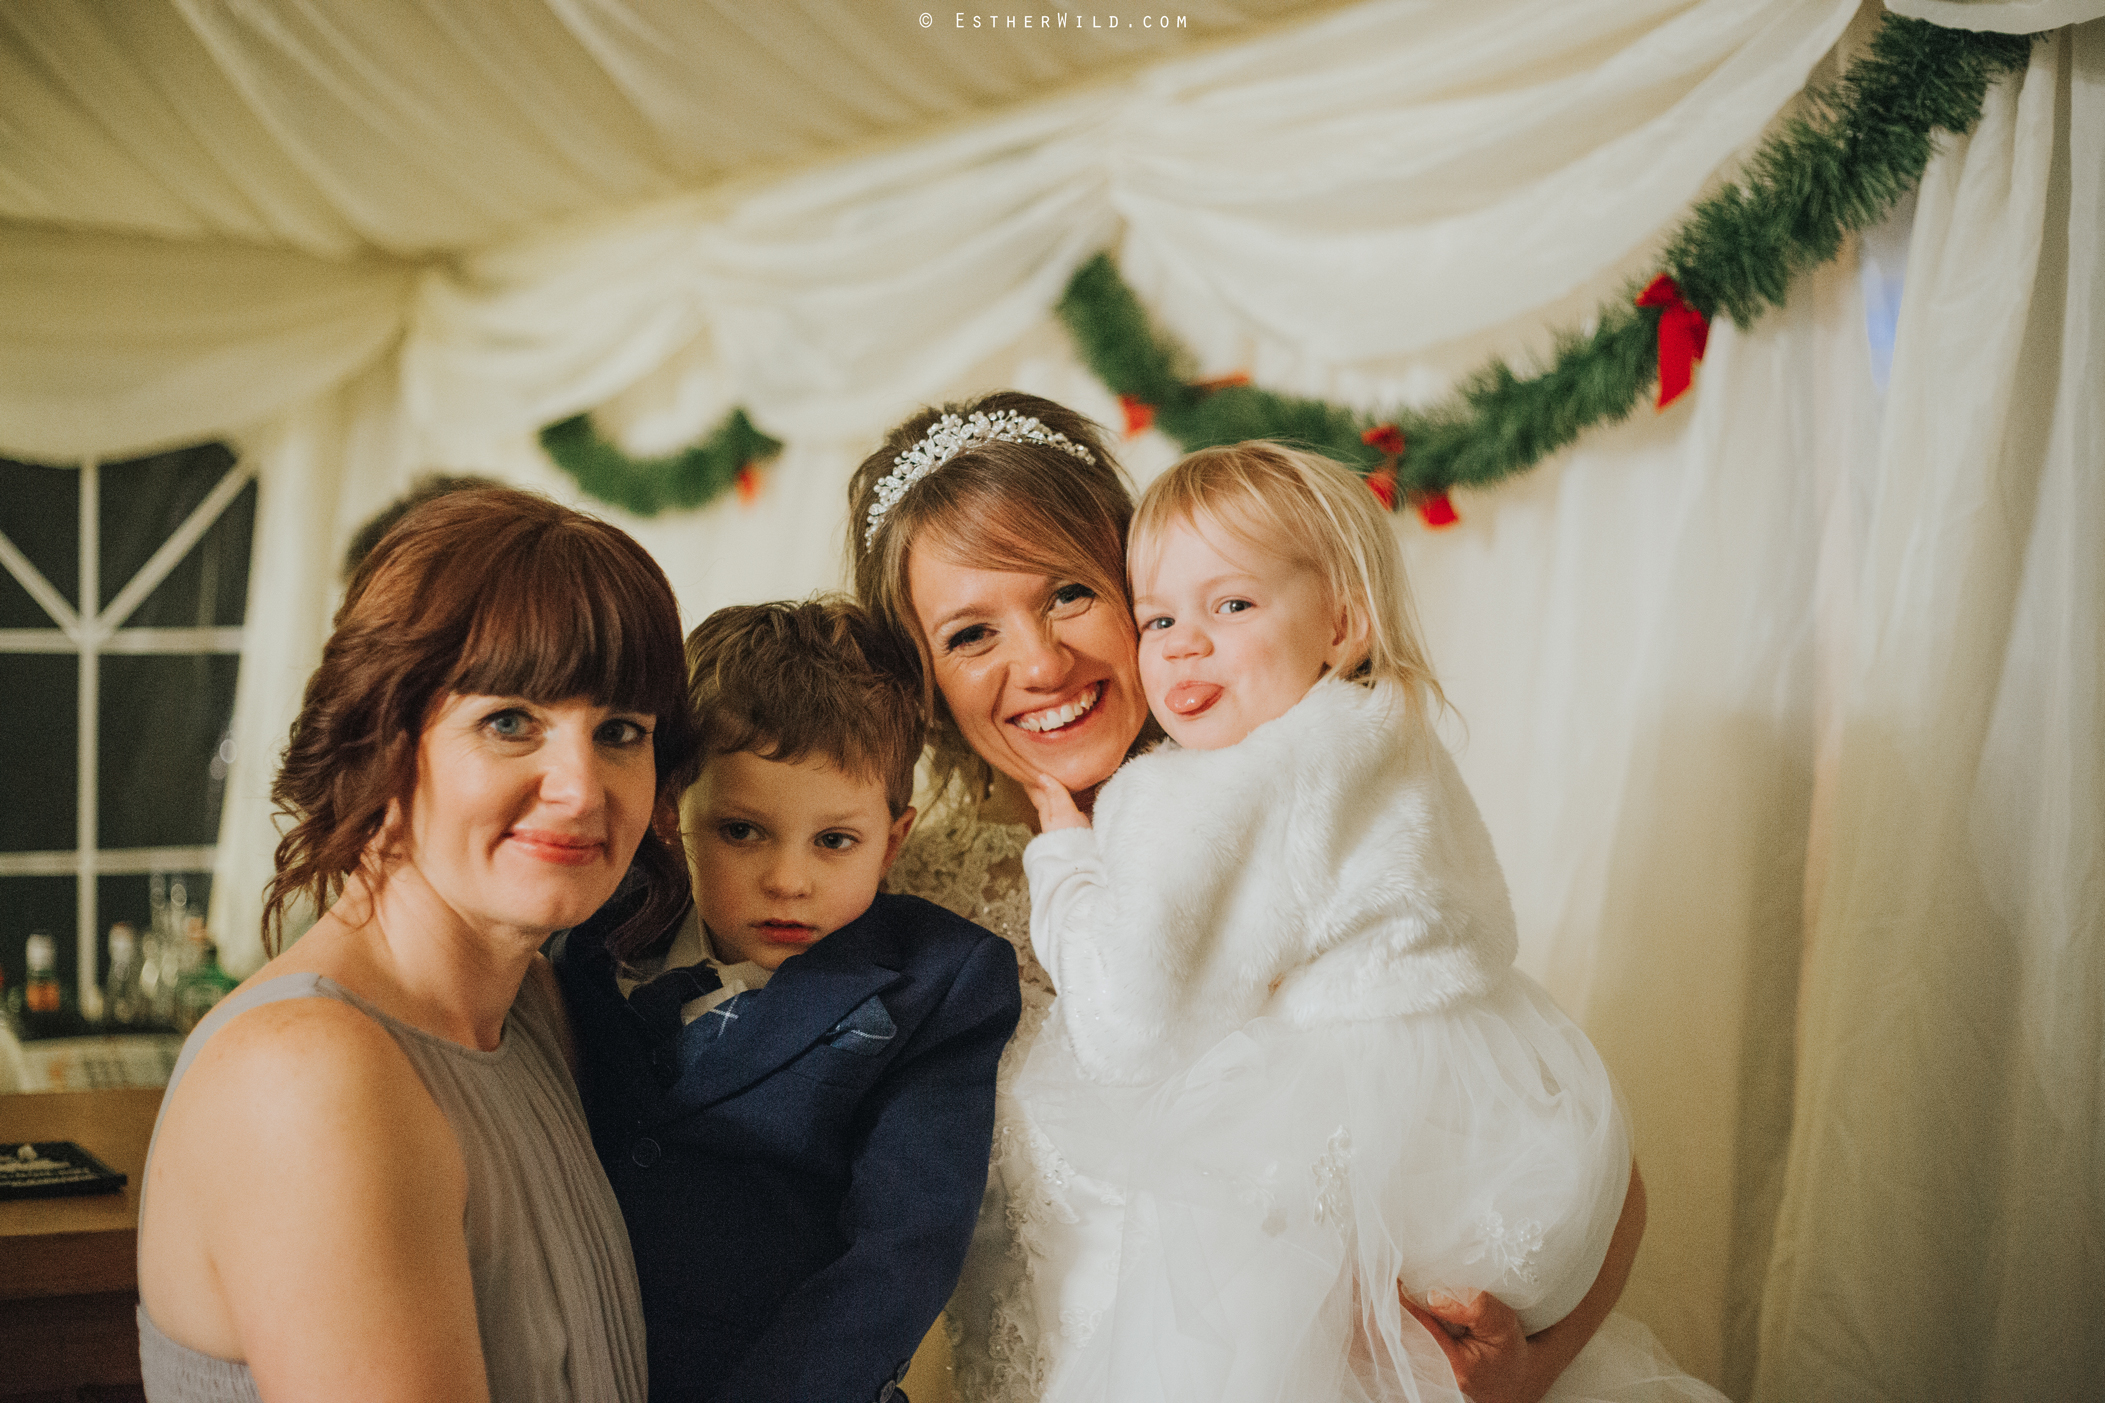 Wedding_Photography_Diss_Gawdy_Hall_Redenhall_Church_Norfolk_Winter_Esther_Wild_Copyright_IMG_2161_IMGL1885.jpg